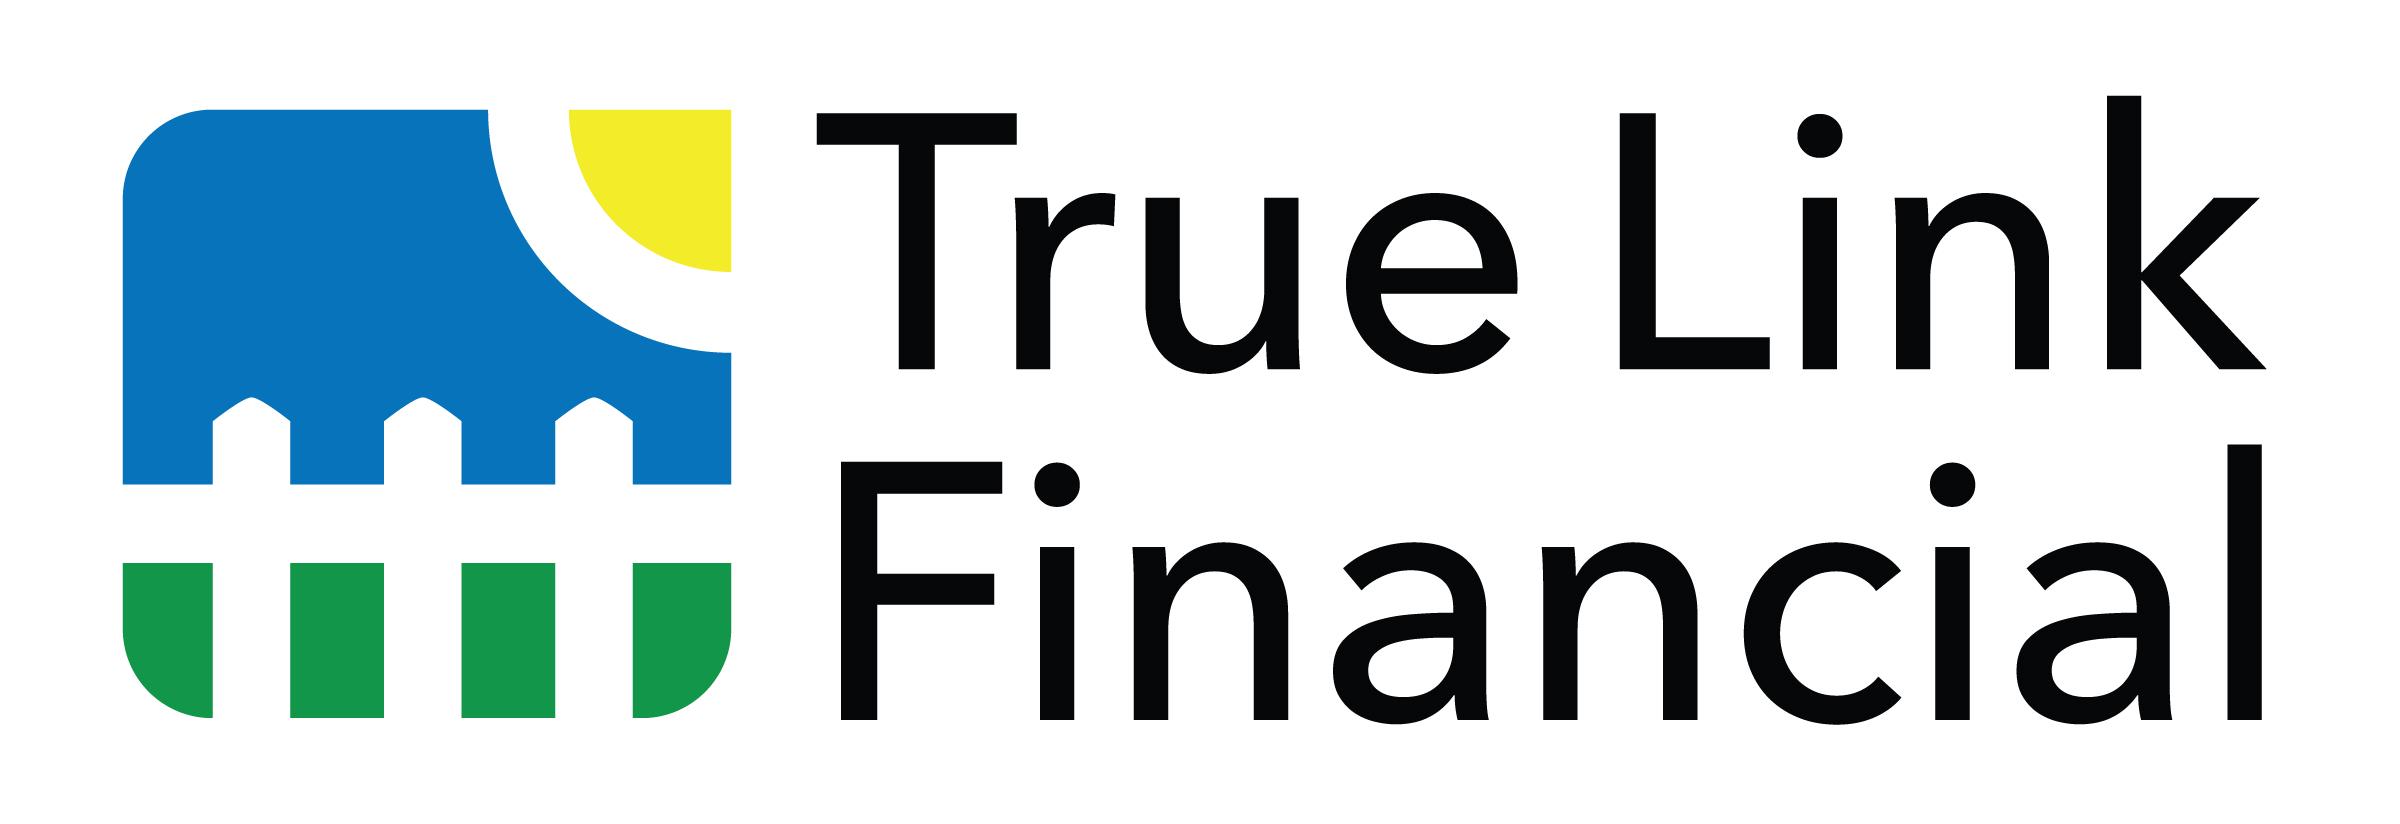 media/2017 True Link-logo-4color-notagline.jpg